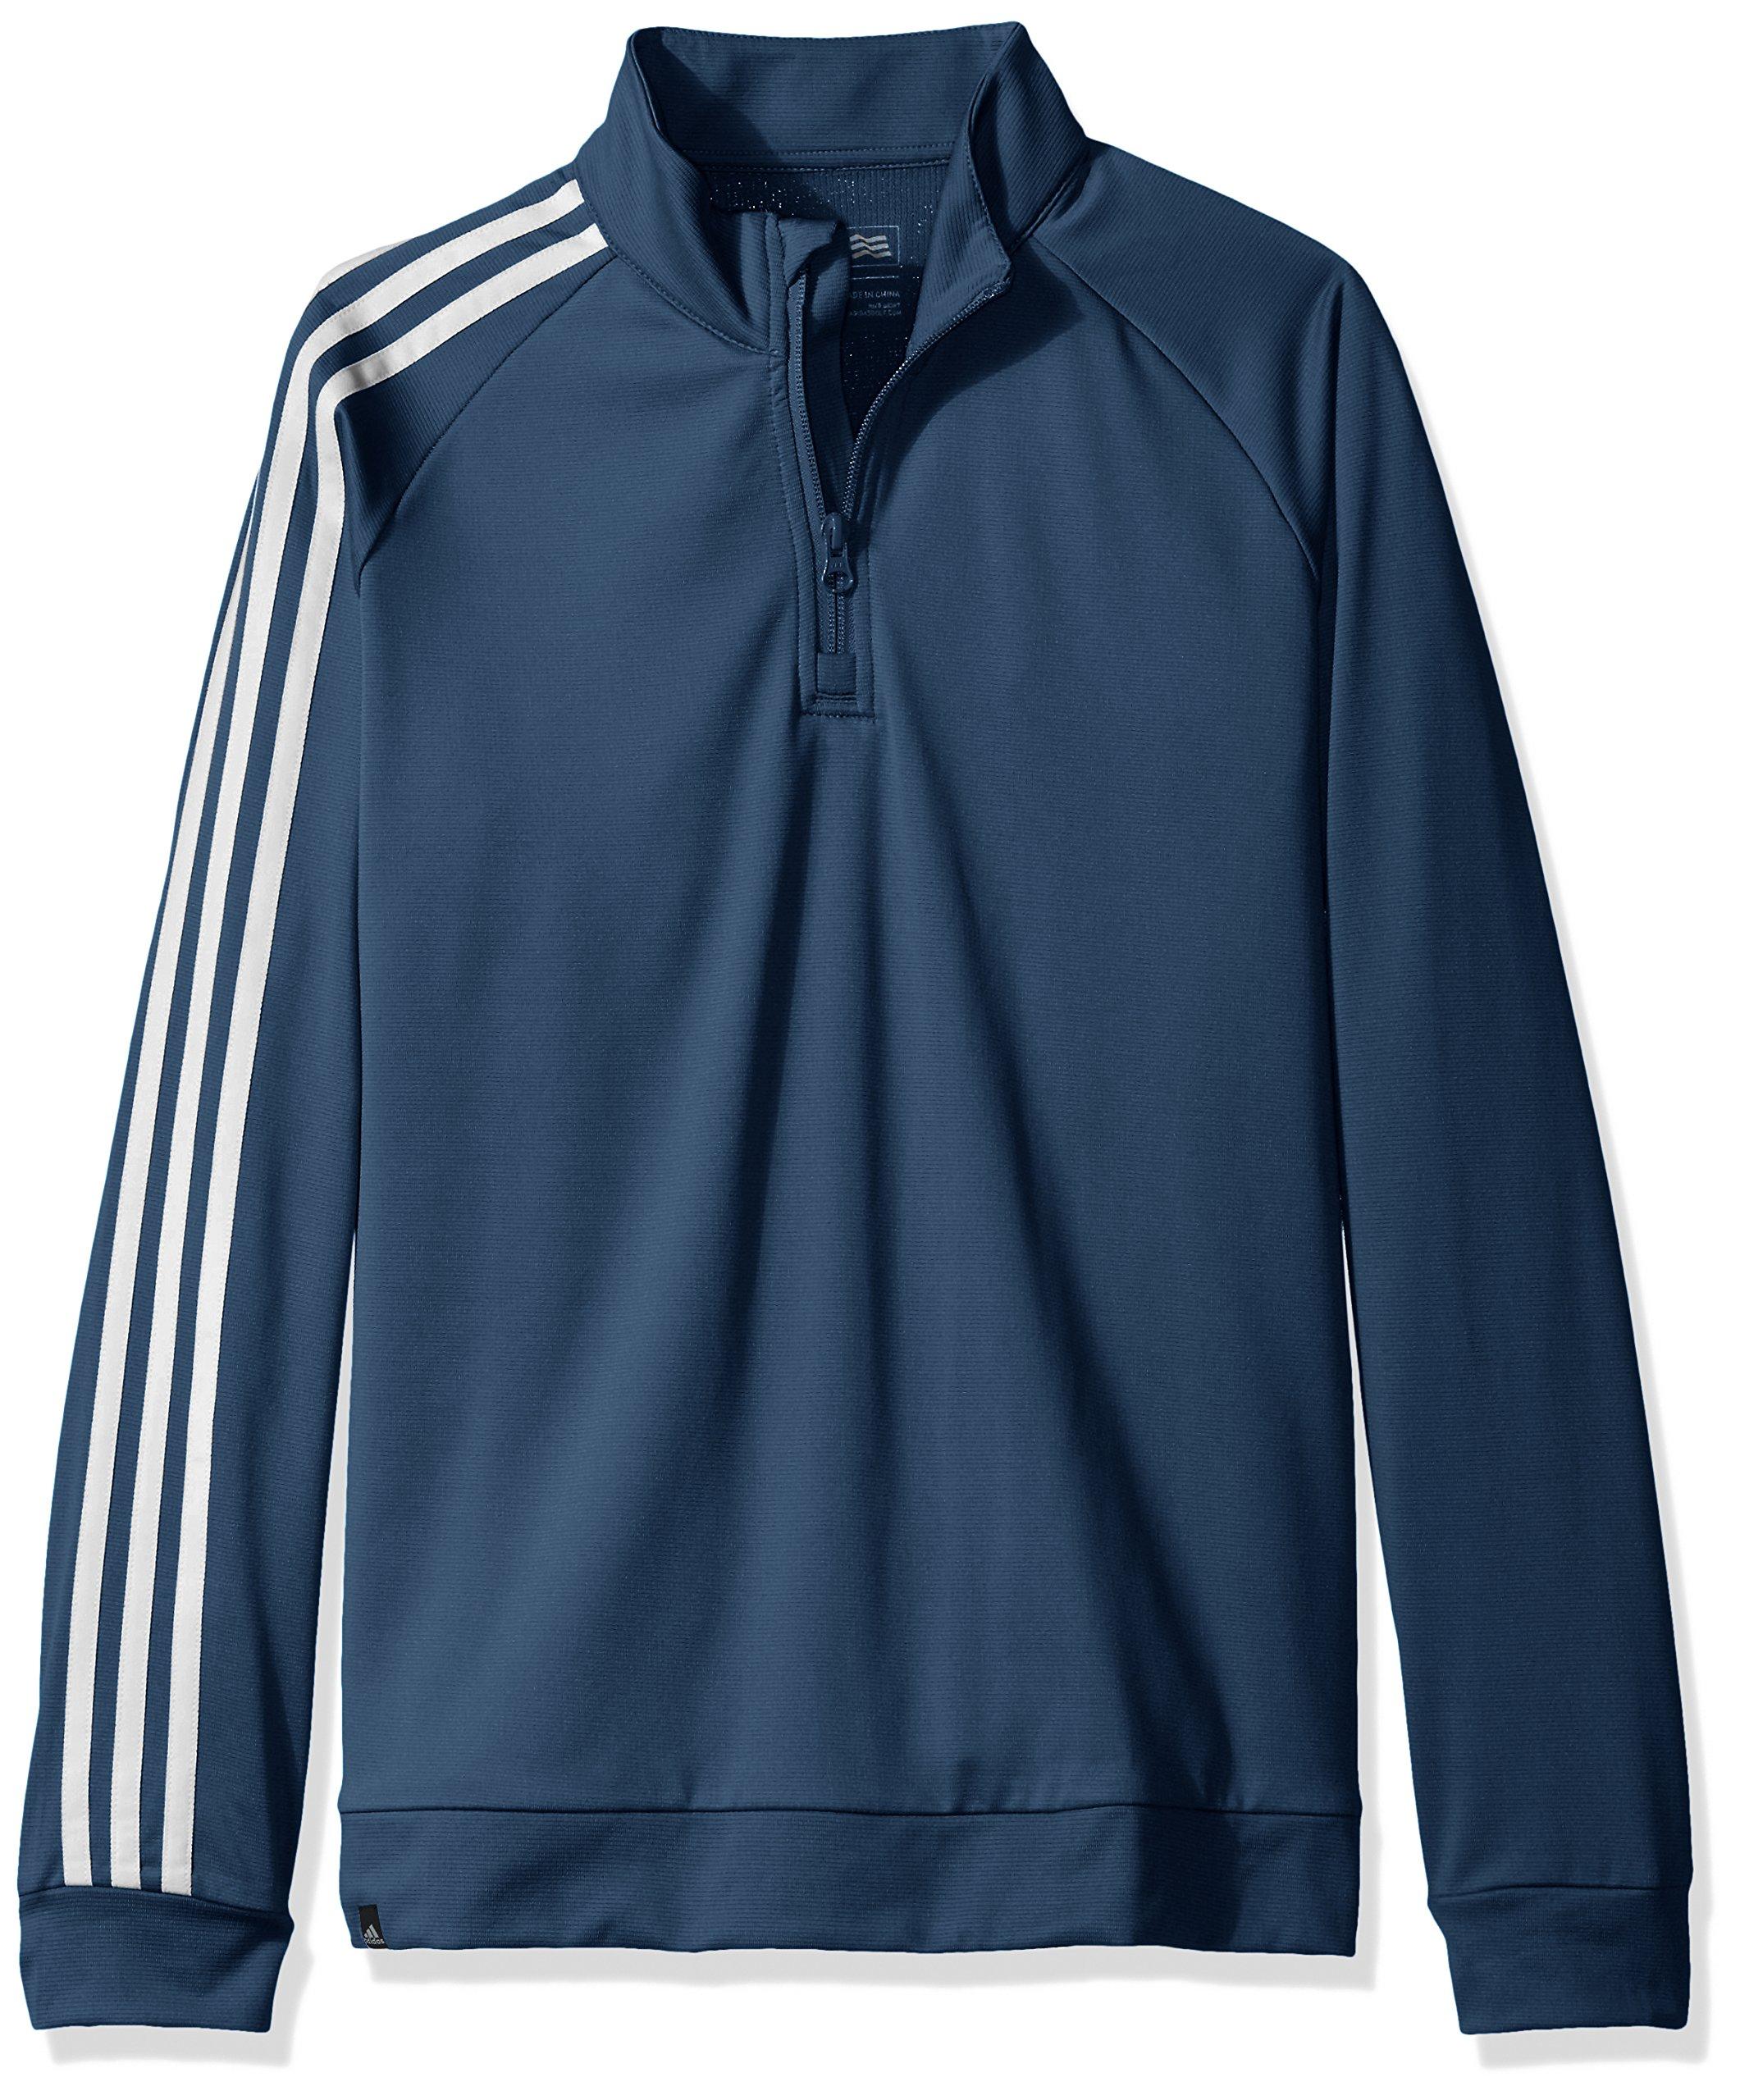 adidas Golf Boy's 3-Stripes Jacket (Big Kids), Mineral Blue, X-Large by adidas